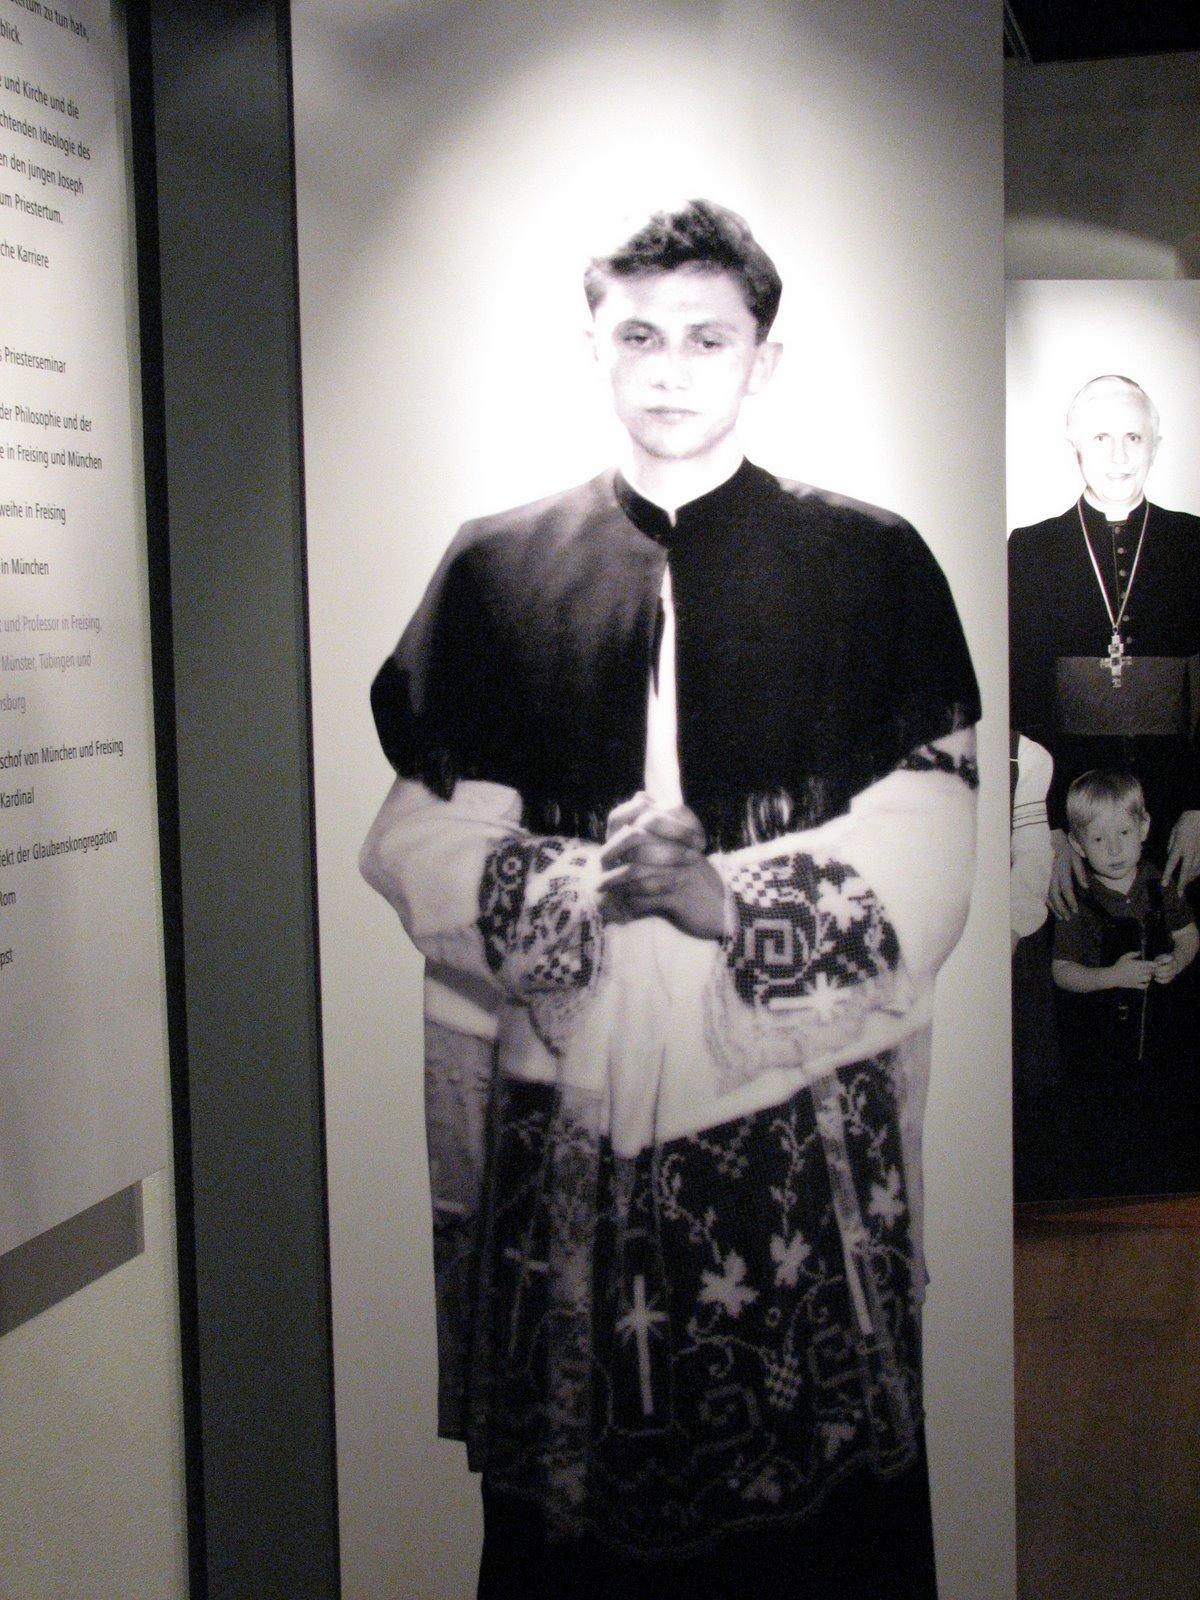 [Ratzinger]